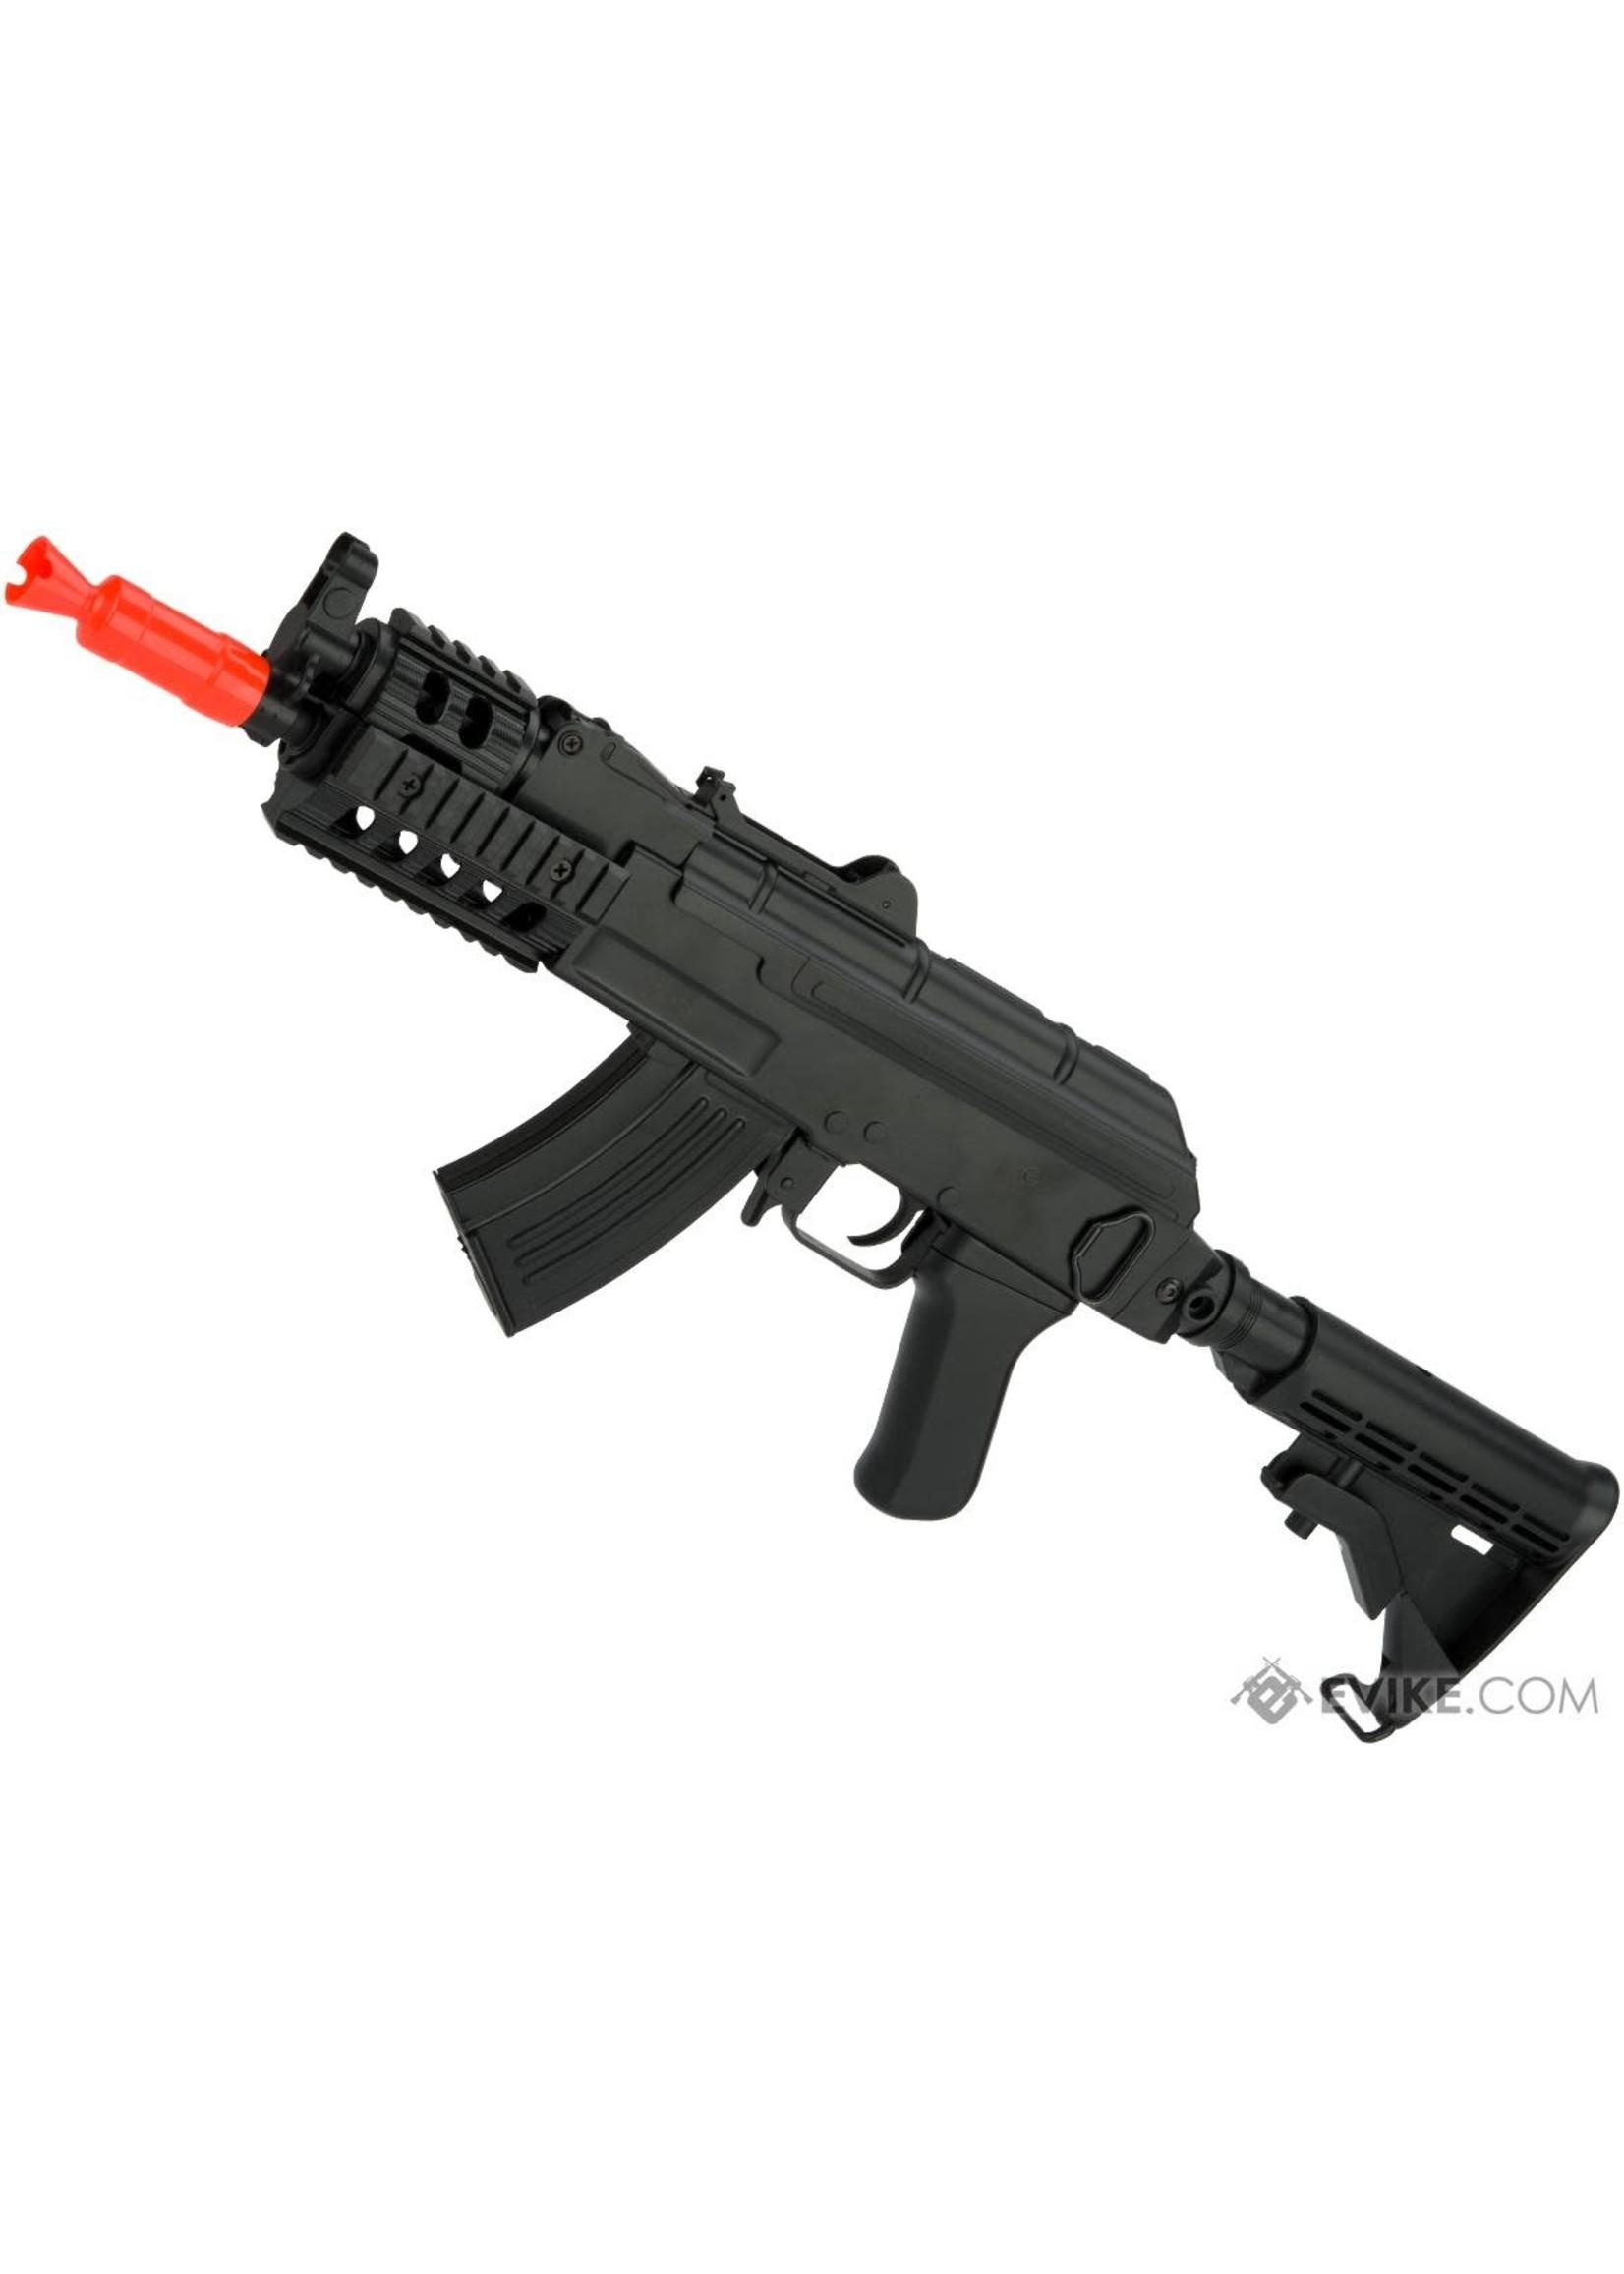 CYMA CYMA Sport Full Size AK Beta Spetsnaz Airsoft AEG Rifle w/ RIS & LE Stock